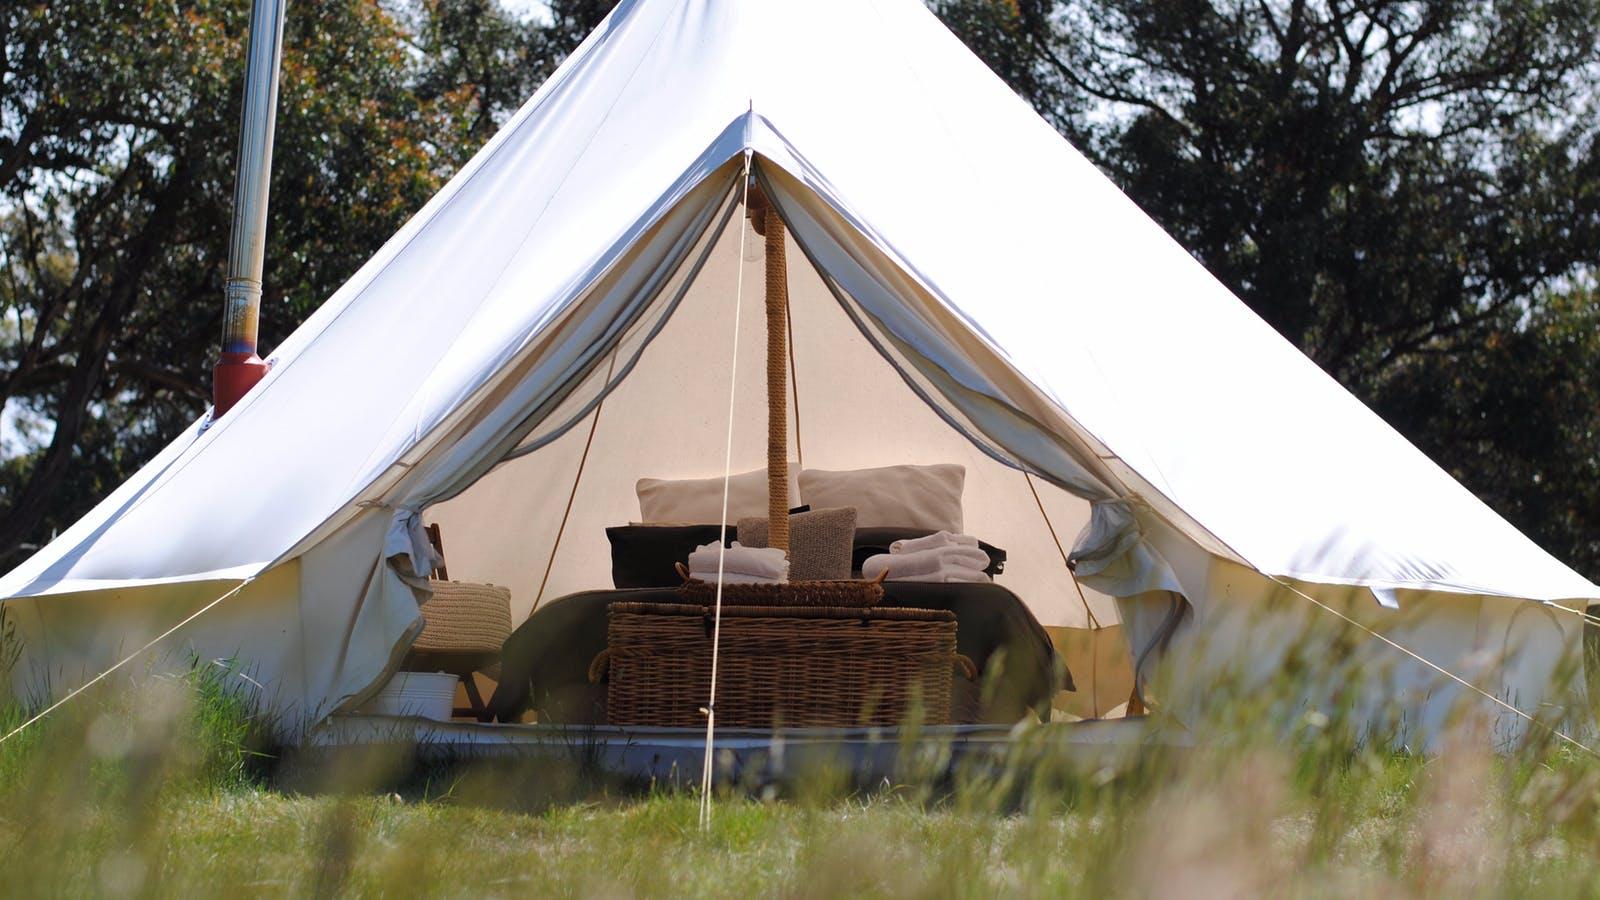 Cosy Tents - Inside five metre bell tent